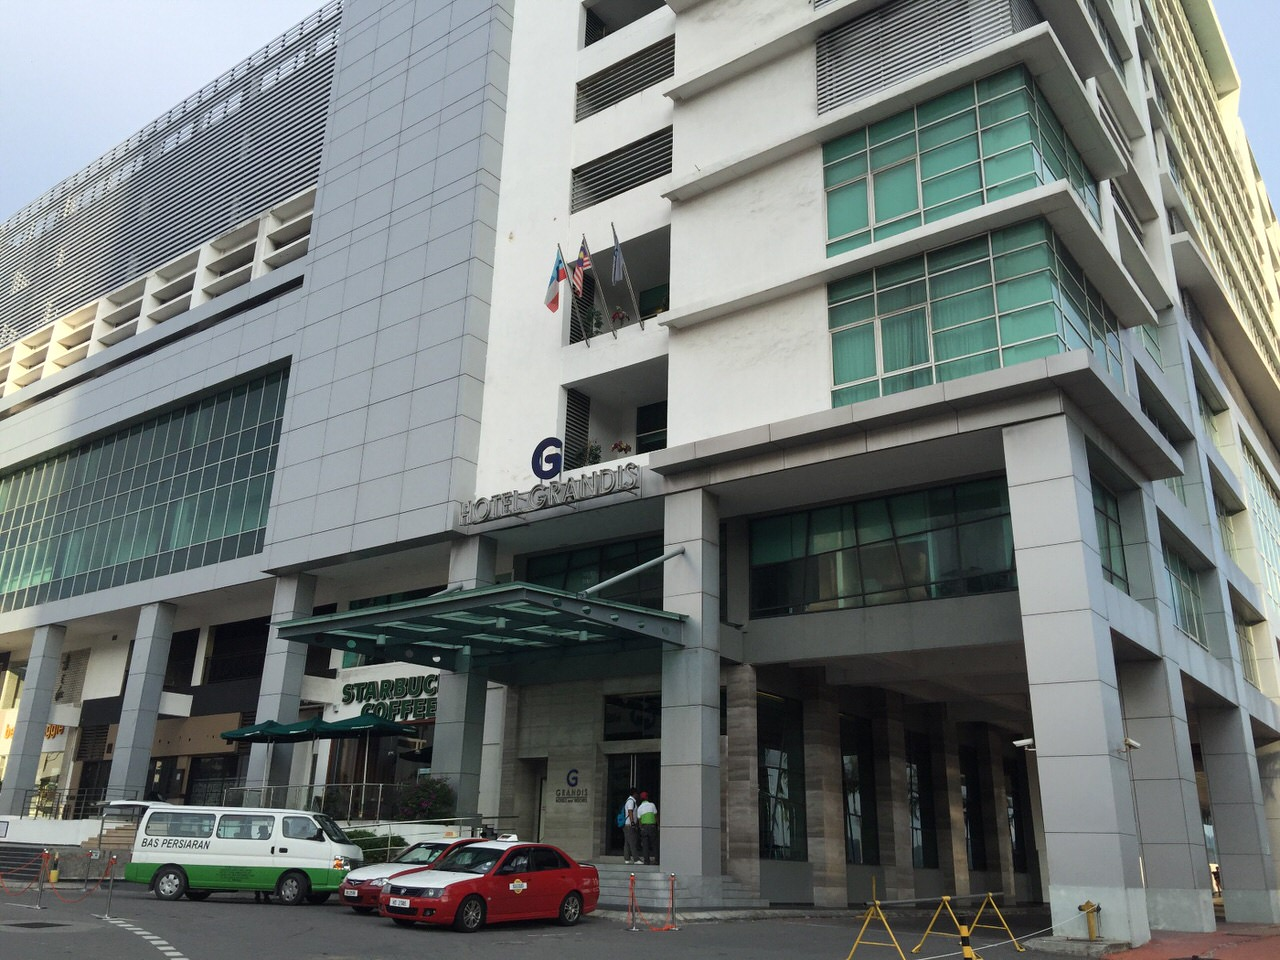 「Hotel Grandis(ホテルグランディス)」コタキナバルの中心街にあるショッピングモール直結のキレイなホテル #マレーシア #サバ州